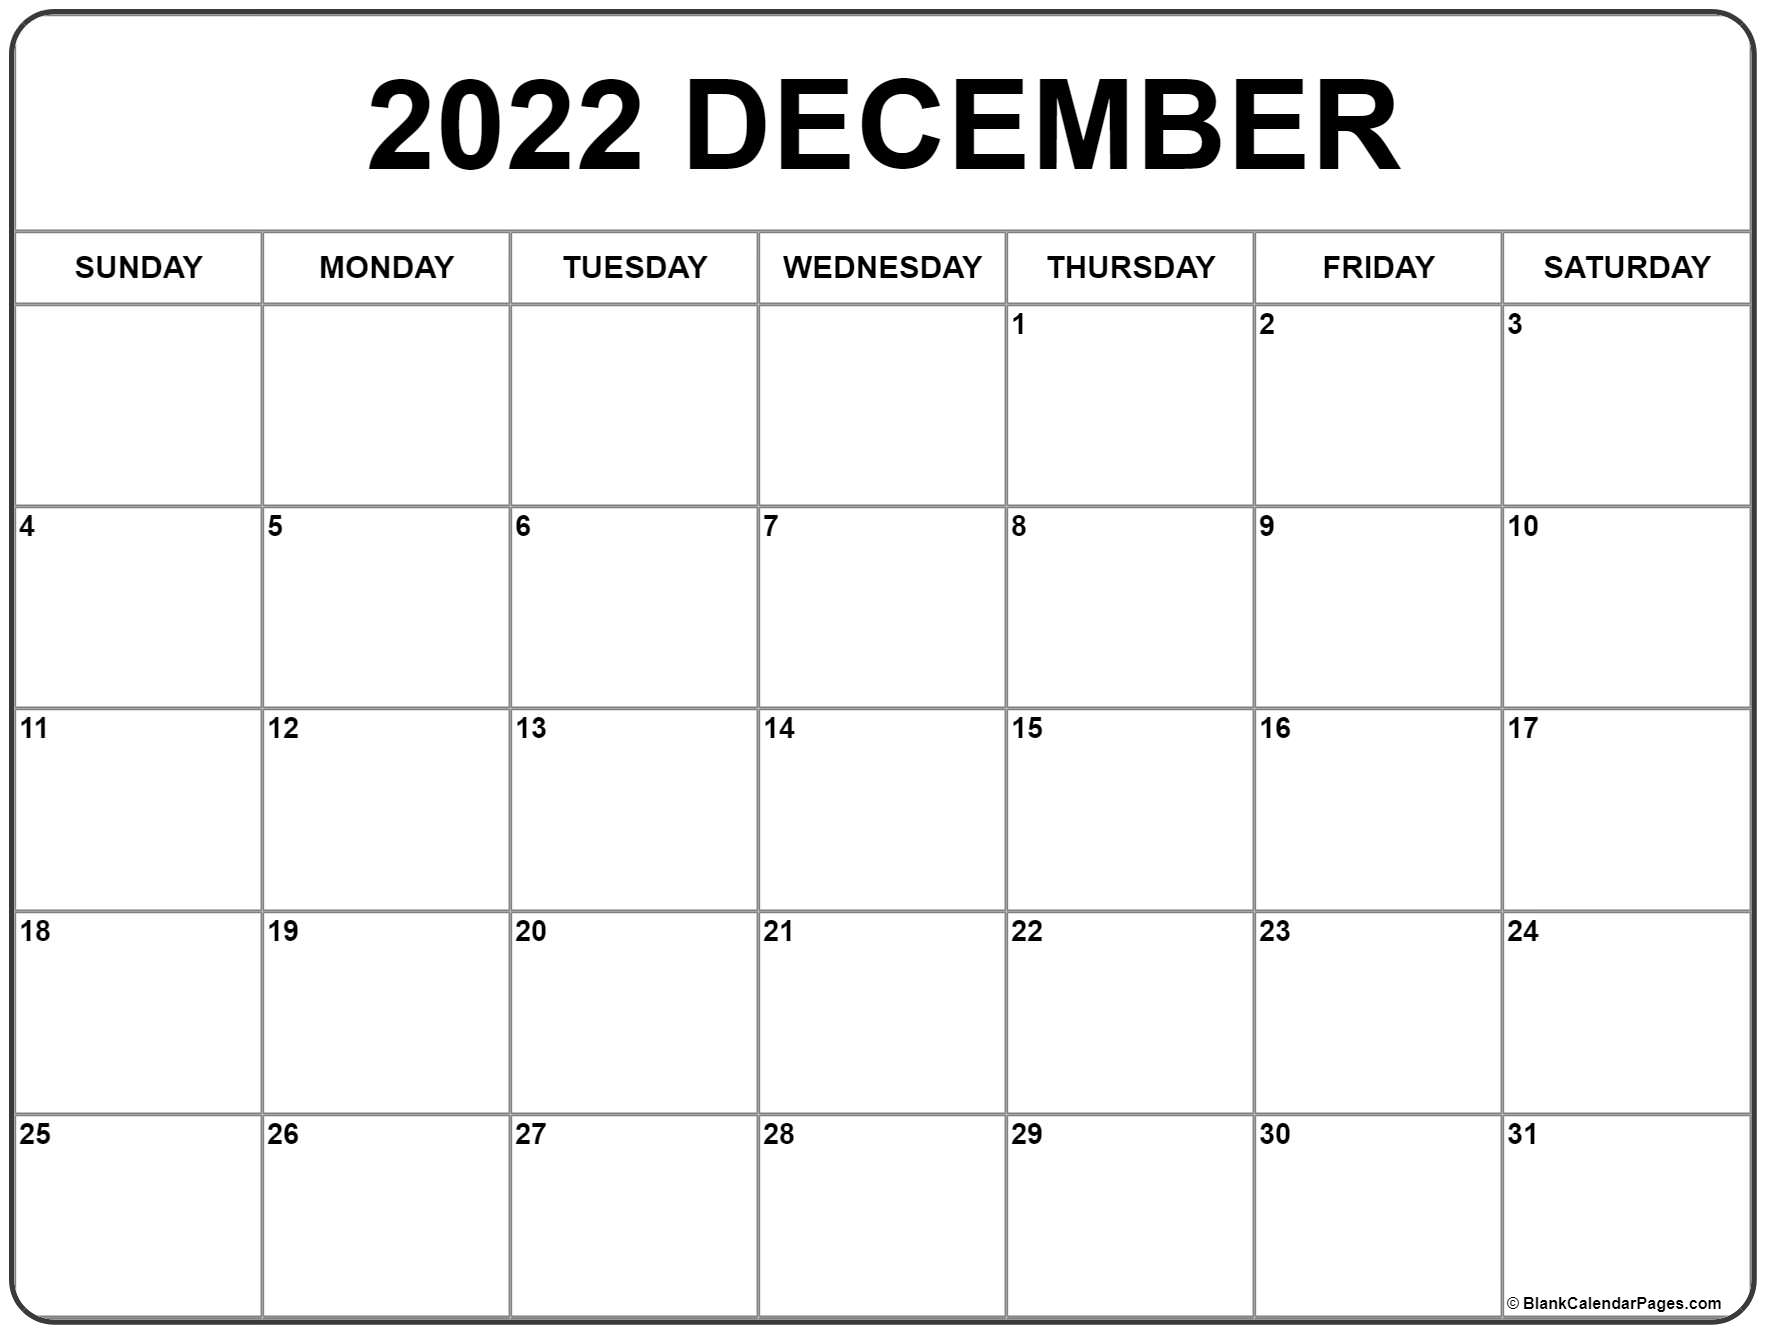 Calendar For December 2022.December 2022 Calendar Free Printable Calendar Templates